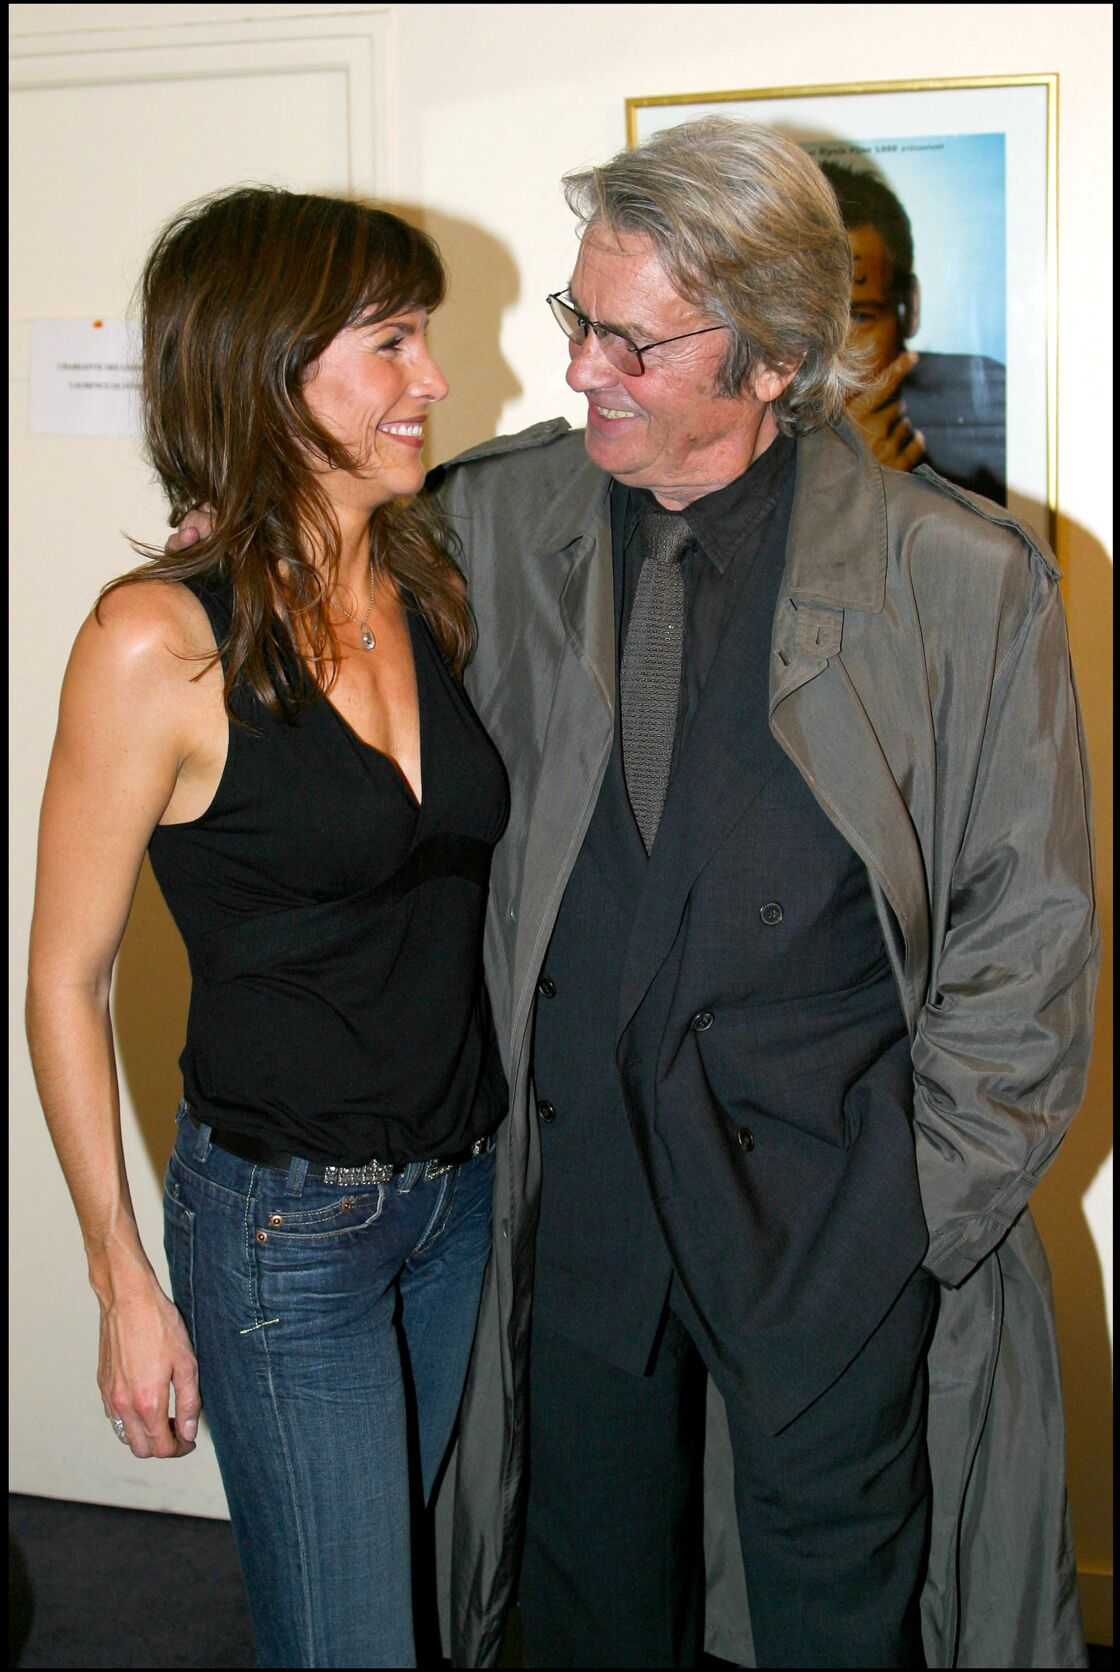 Astrid Veillon et Alain Delon le 27 octobre 2003